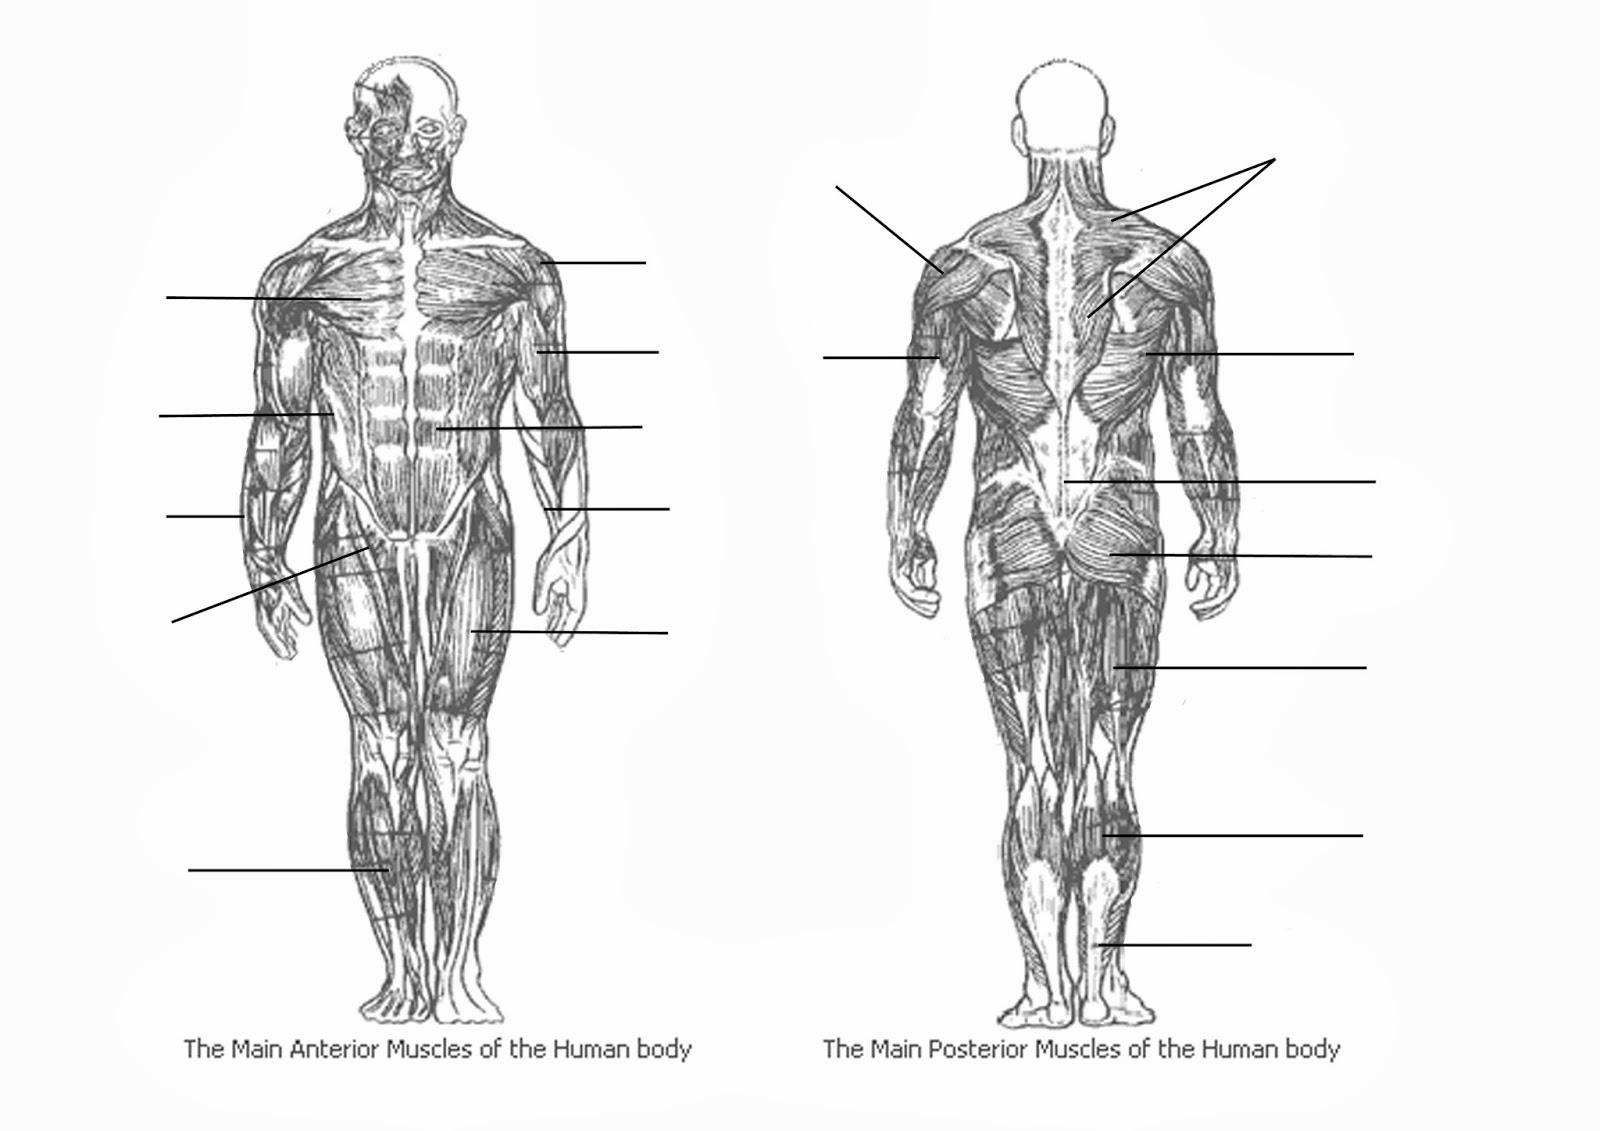 Unlabeled Muscle Diagram Worksheet Worksheets For All